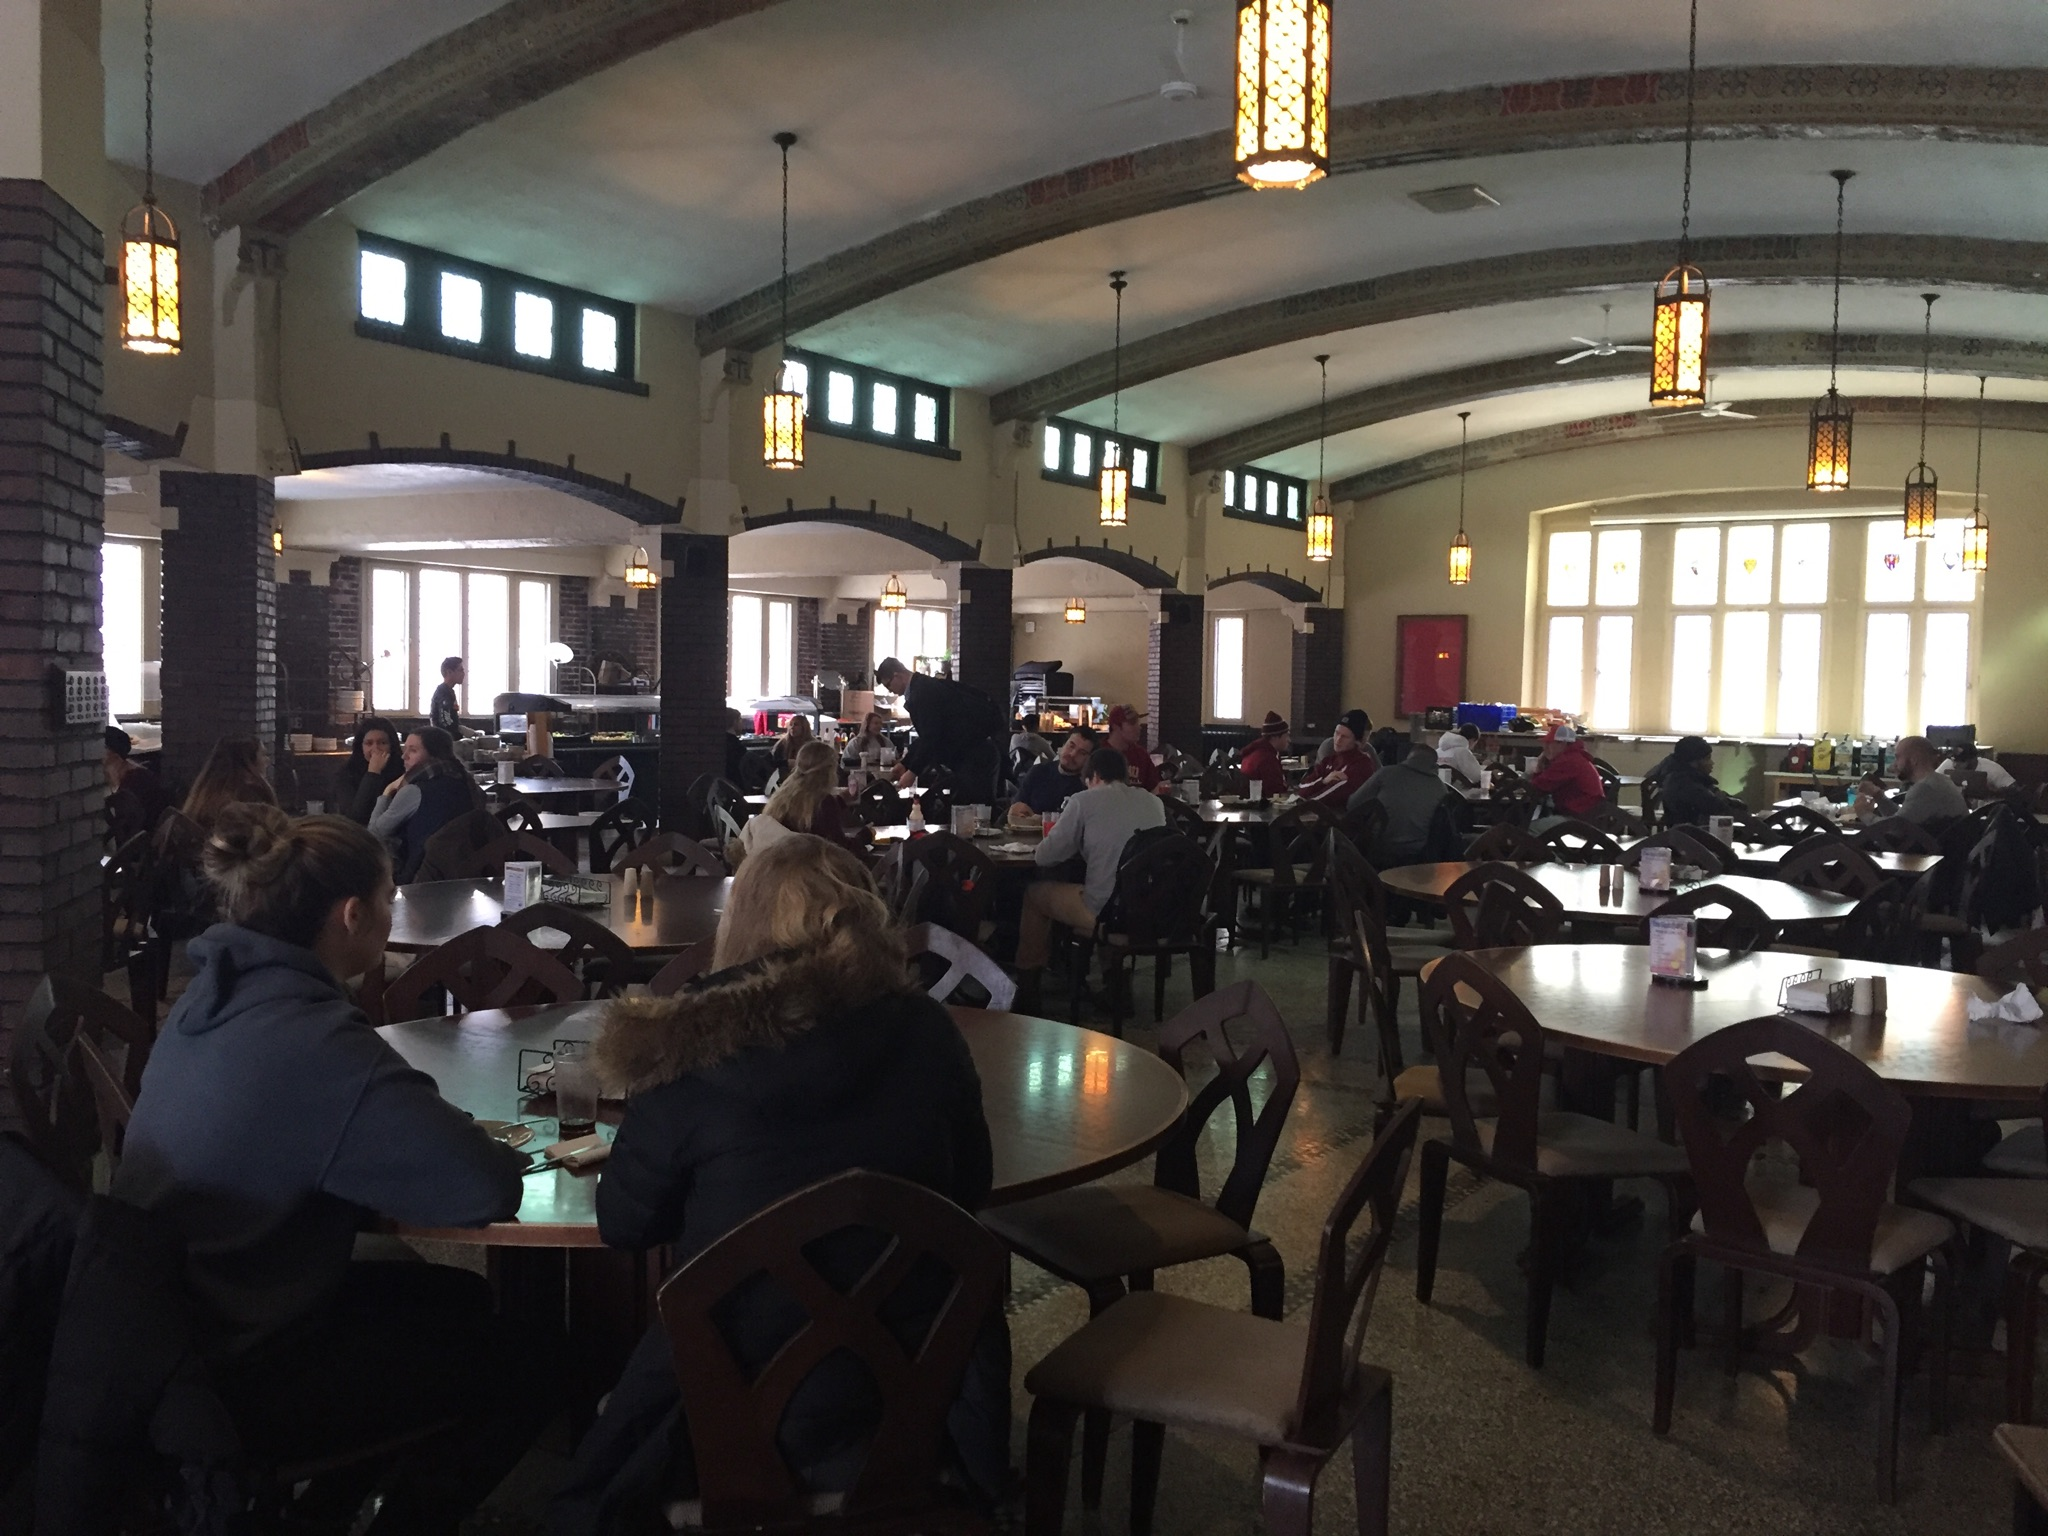 SHU begins dining hall expansion | Setonian Online